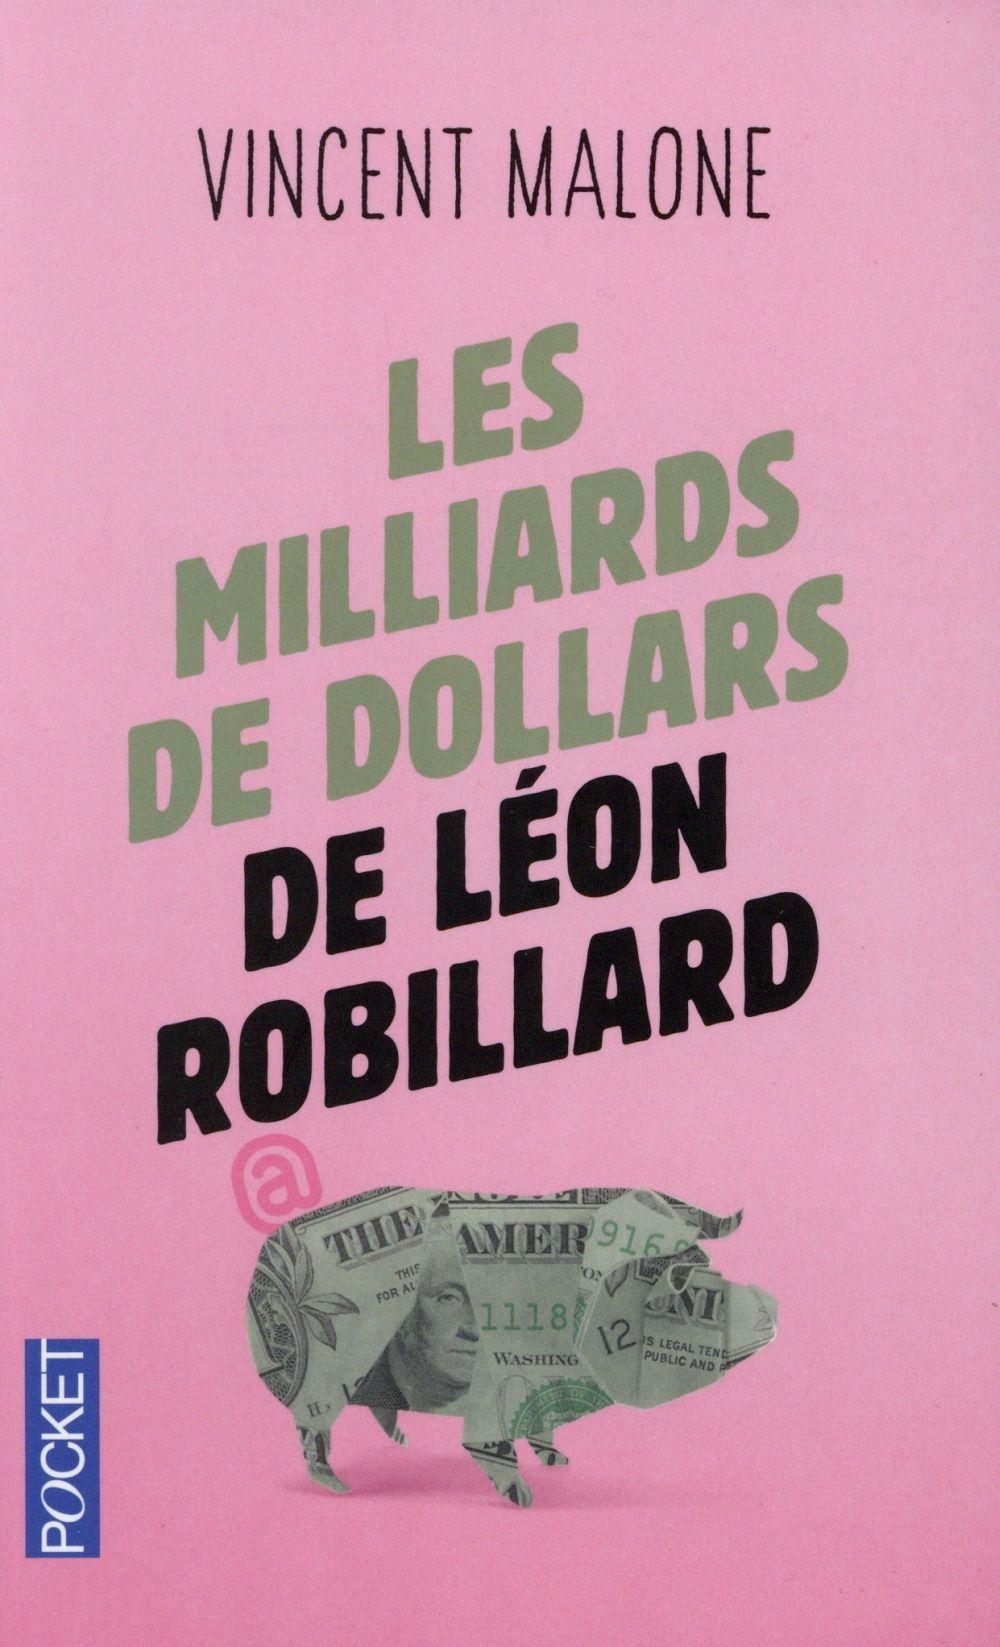 Les milliards de dollars de Léon Robillard